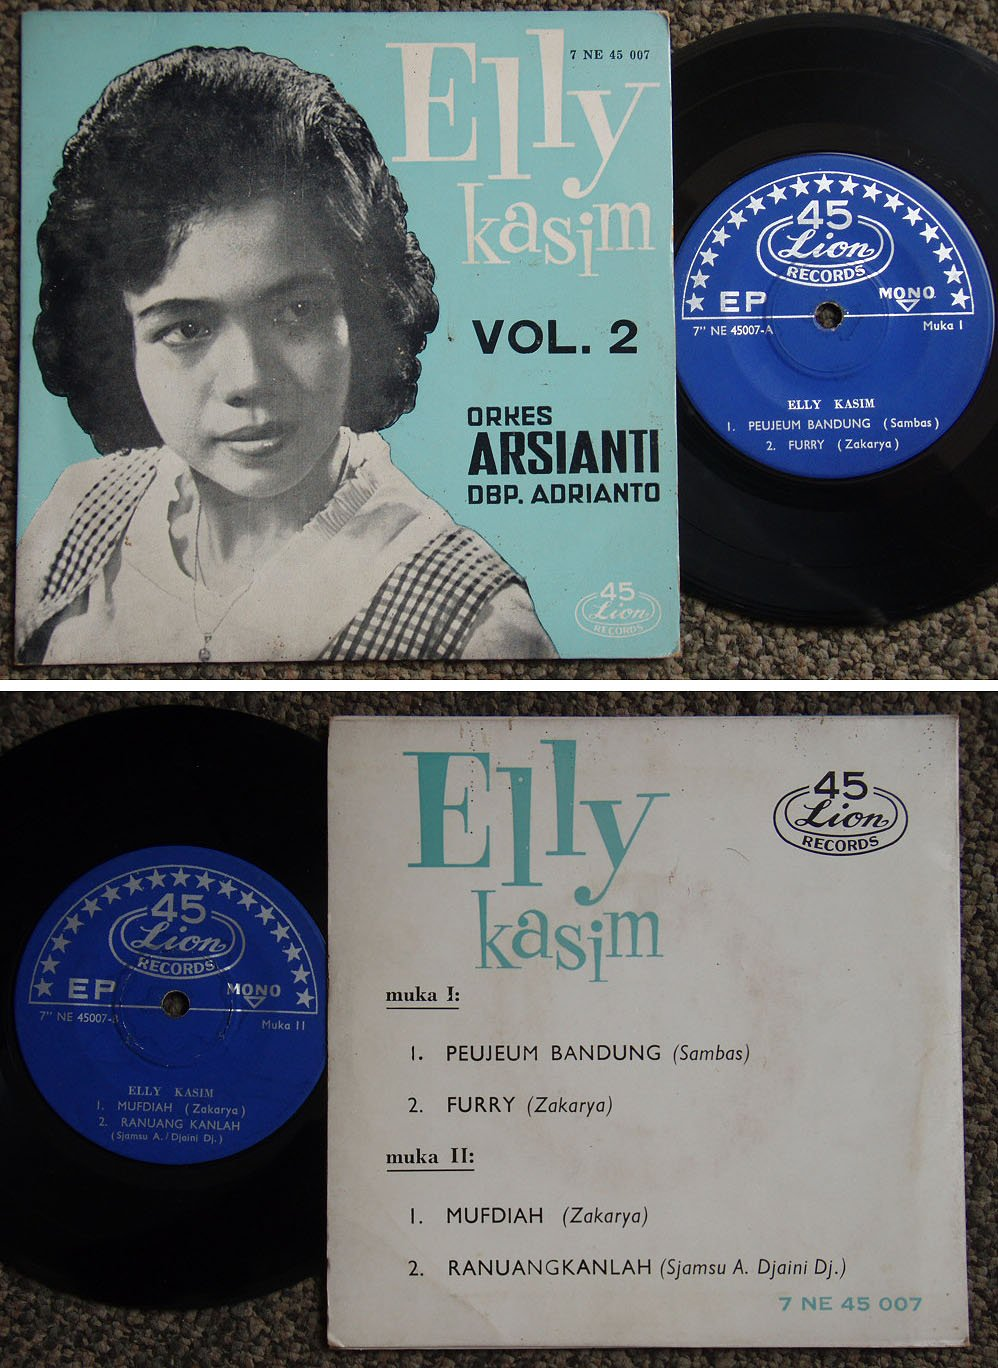 Indonesia ELLY KASIM Malay pop beat EP #45007 (590)